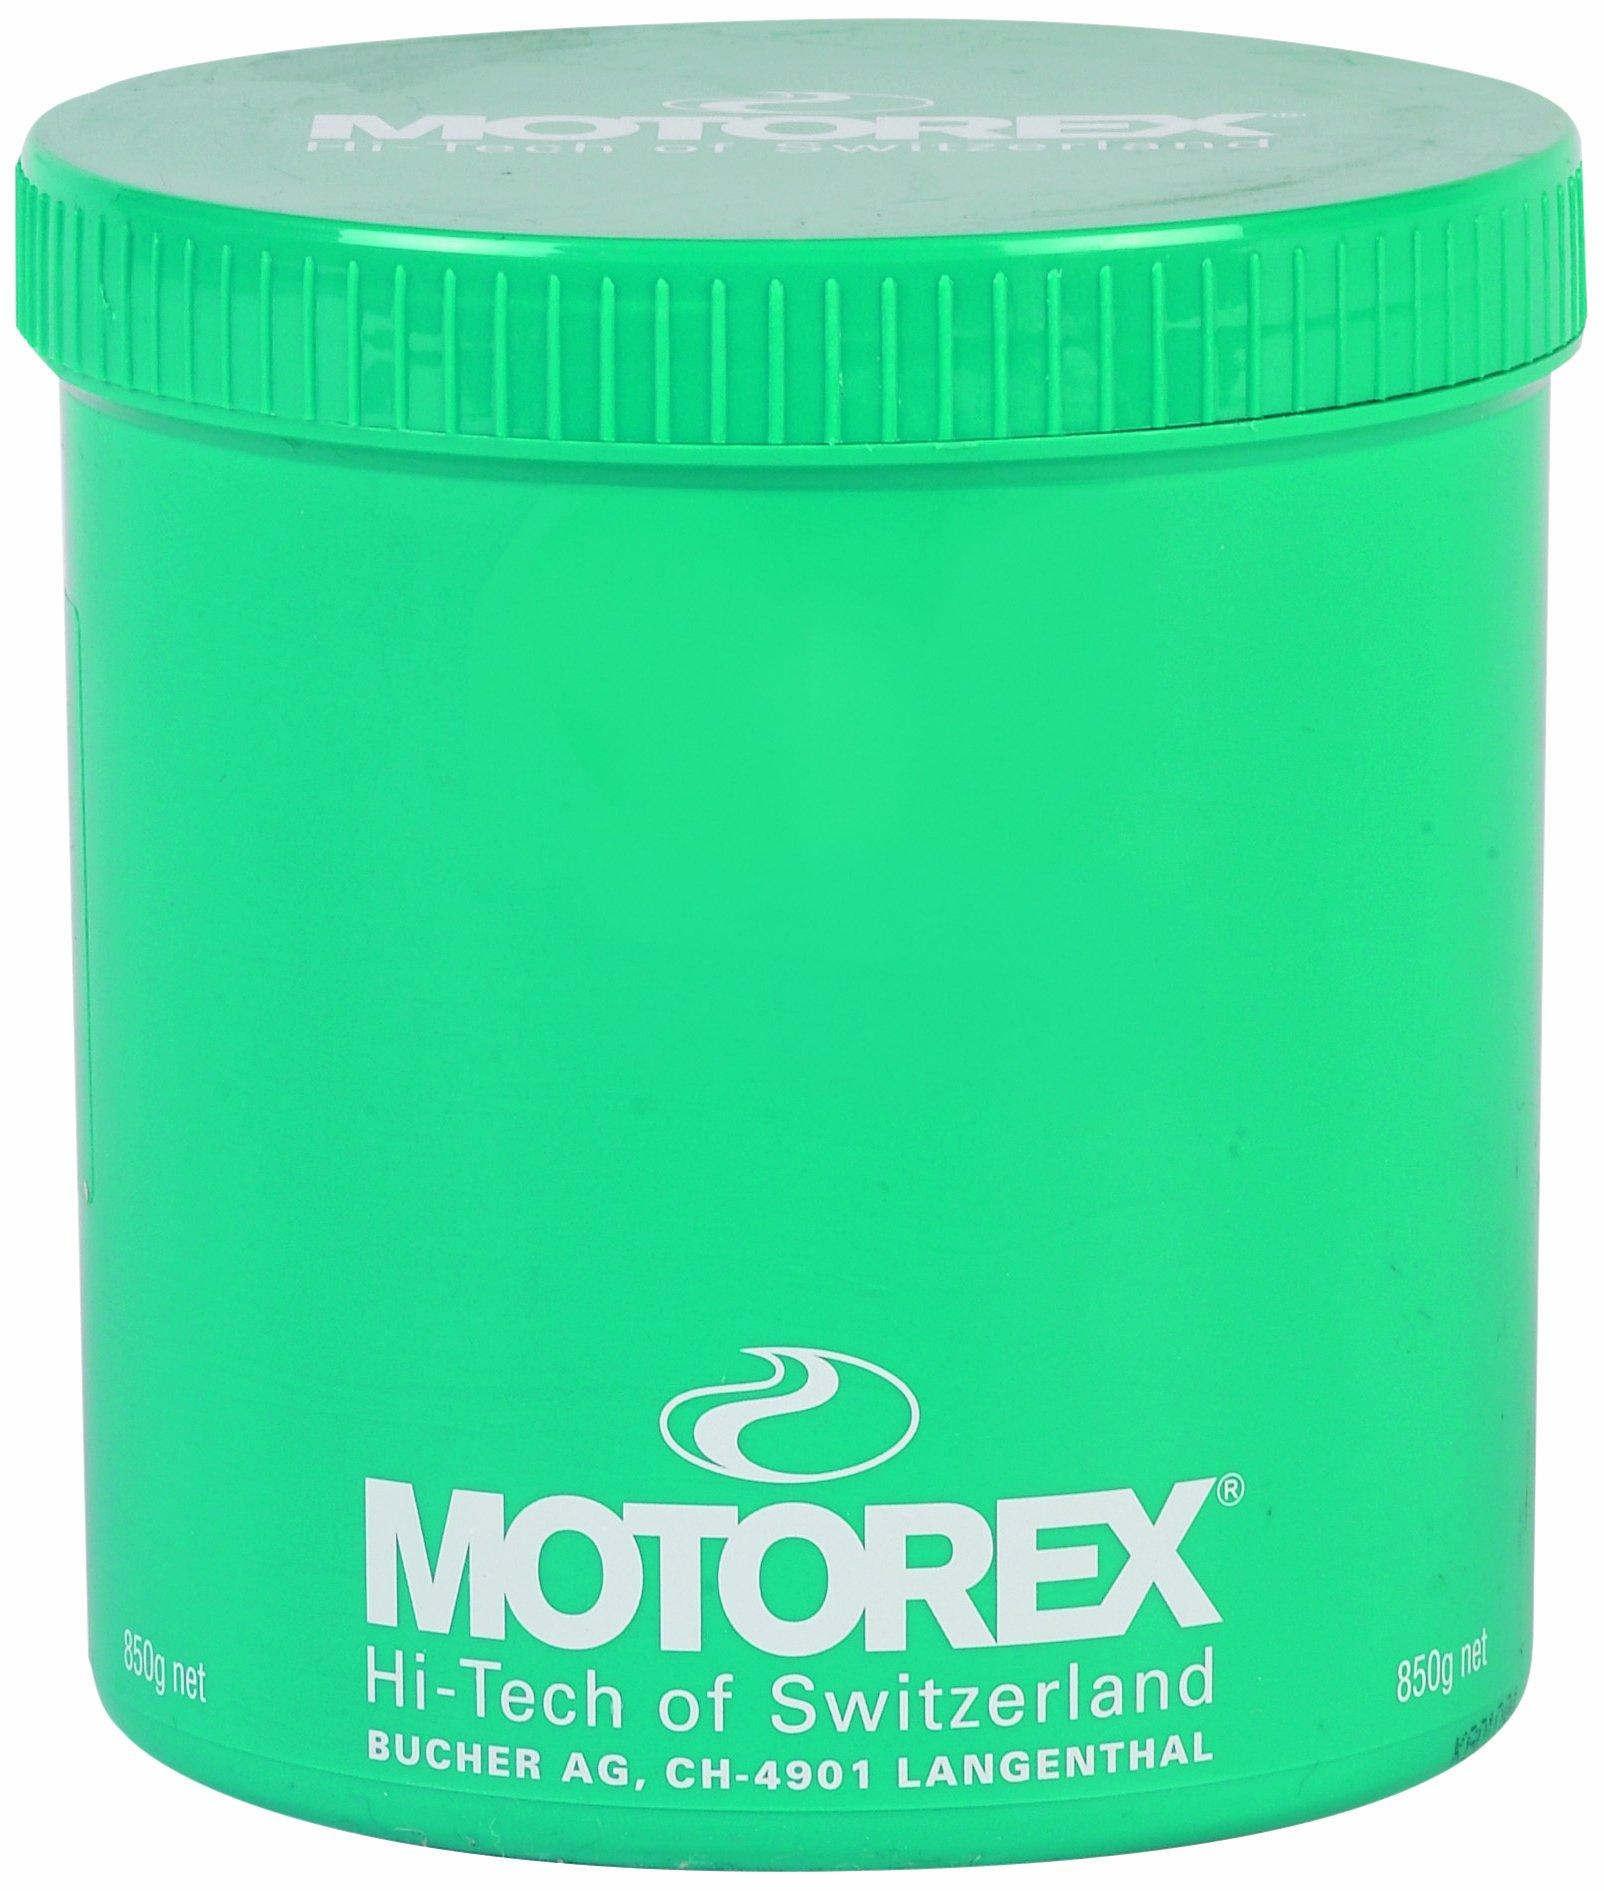 Motorex Bike Grease 2000 850Gr Jar